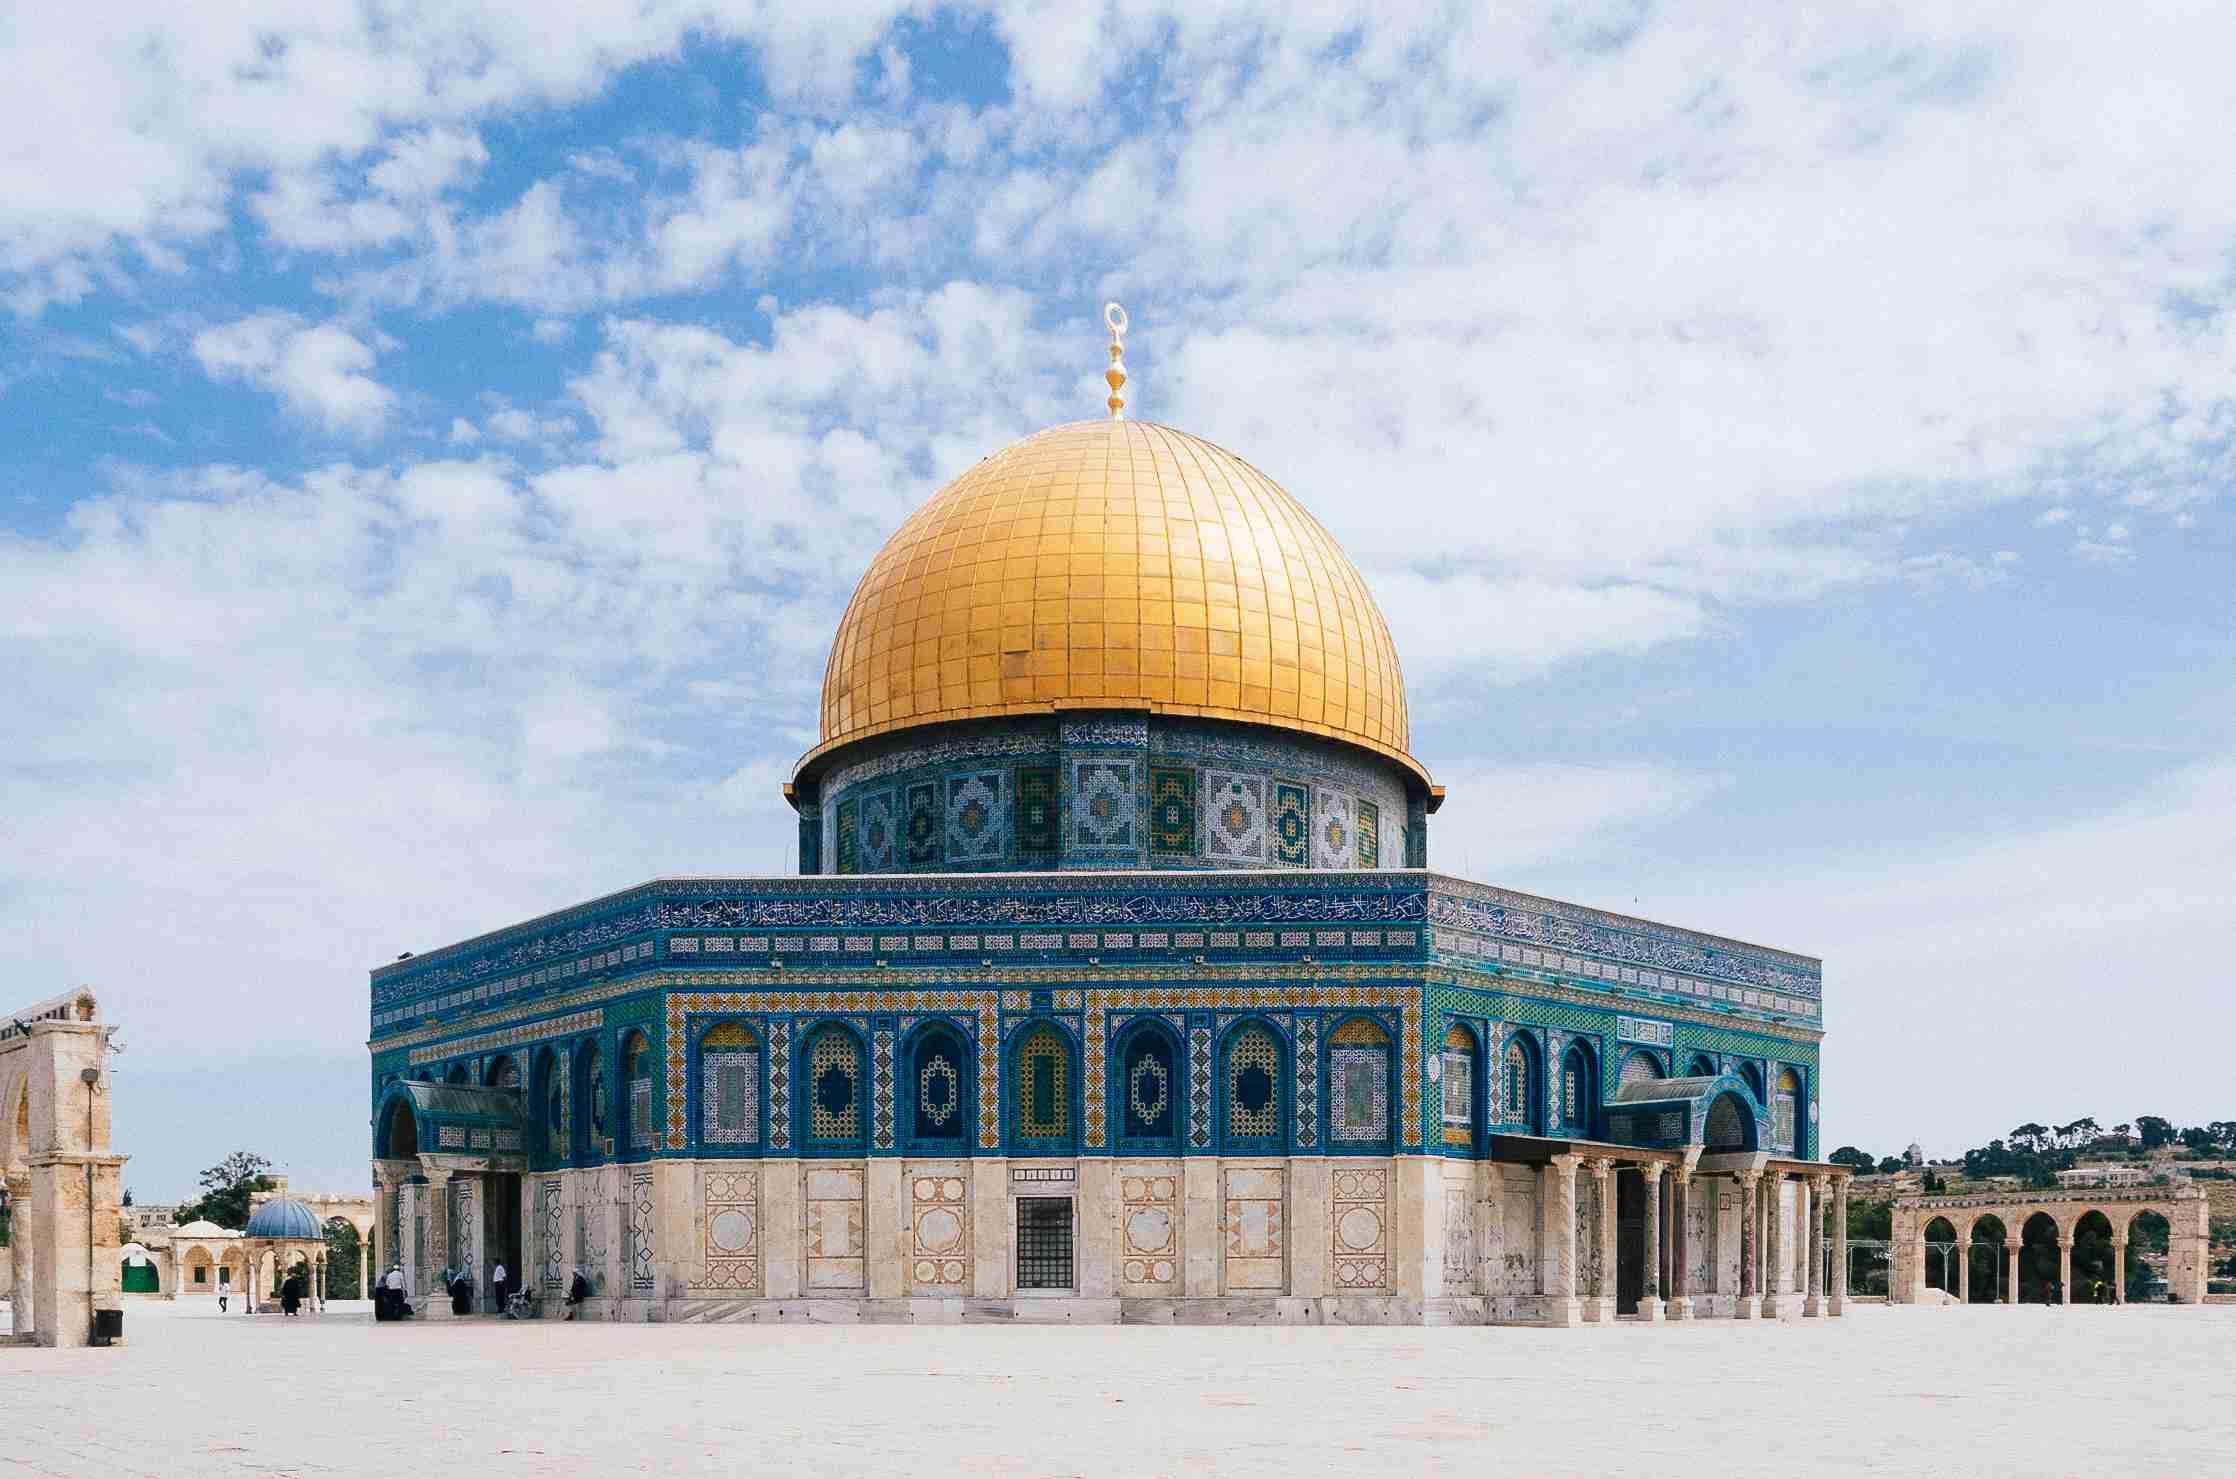 Temple of the Rock in Jerusalem.